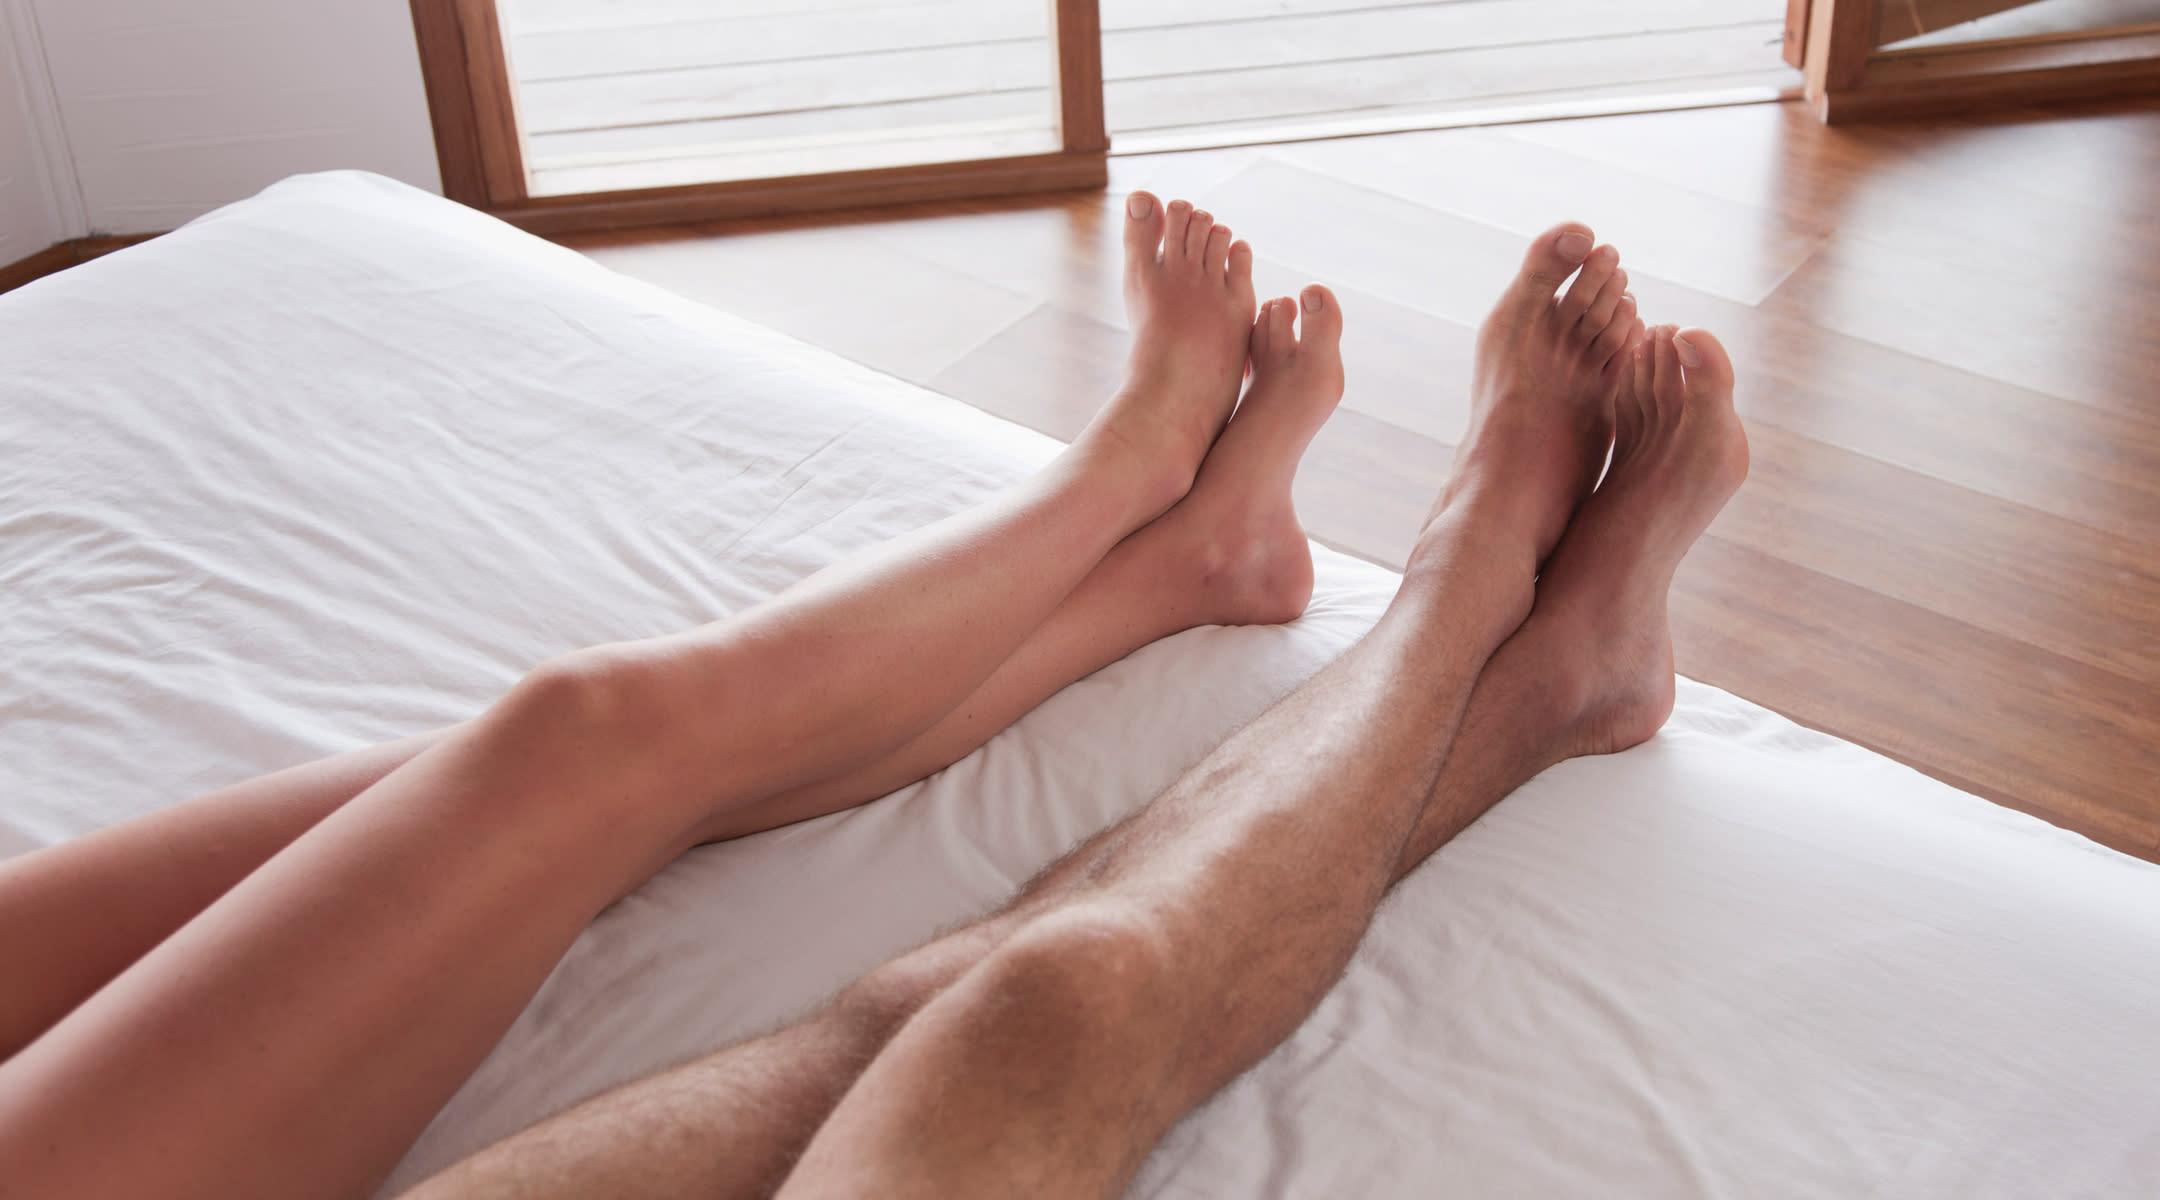 amateur white girls anal sex